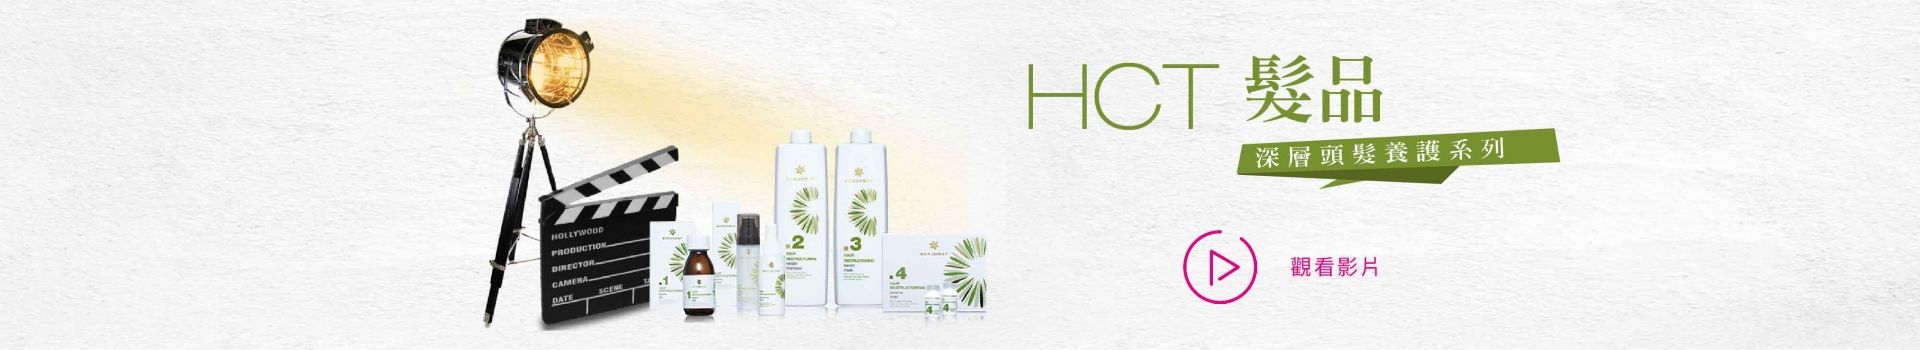 HCT髮品 深層頭髮養護系列